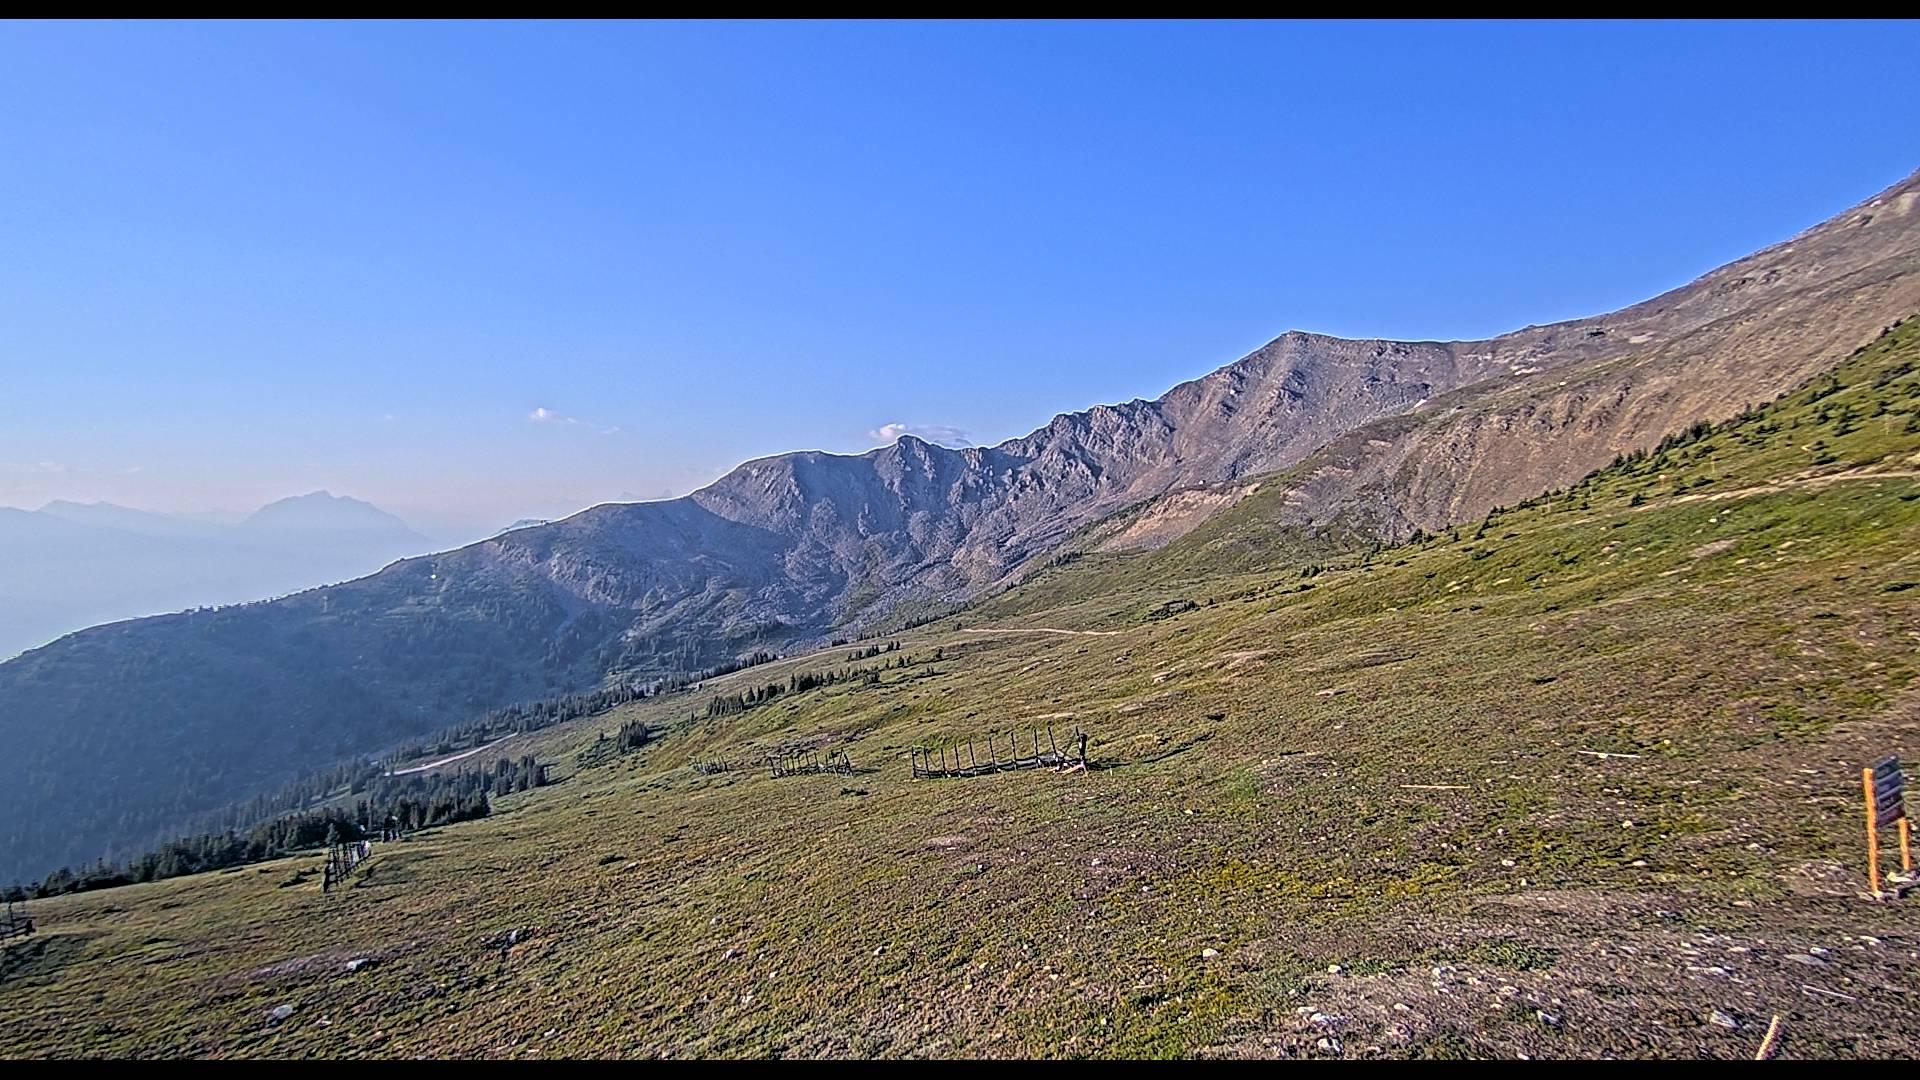 Upper Mountain